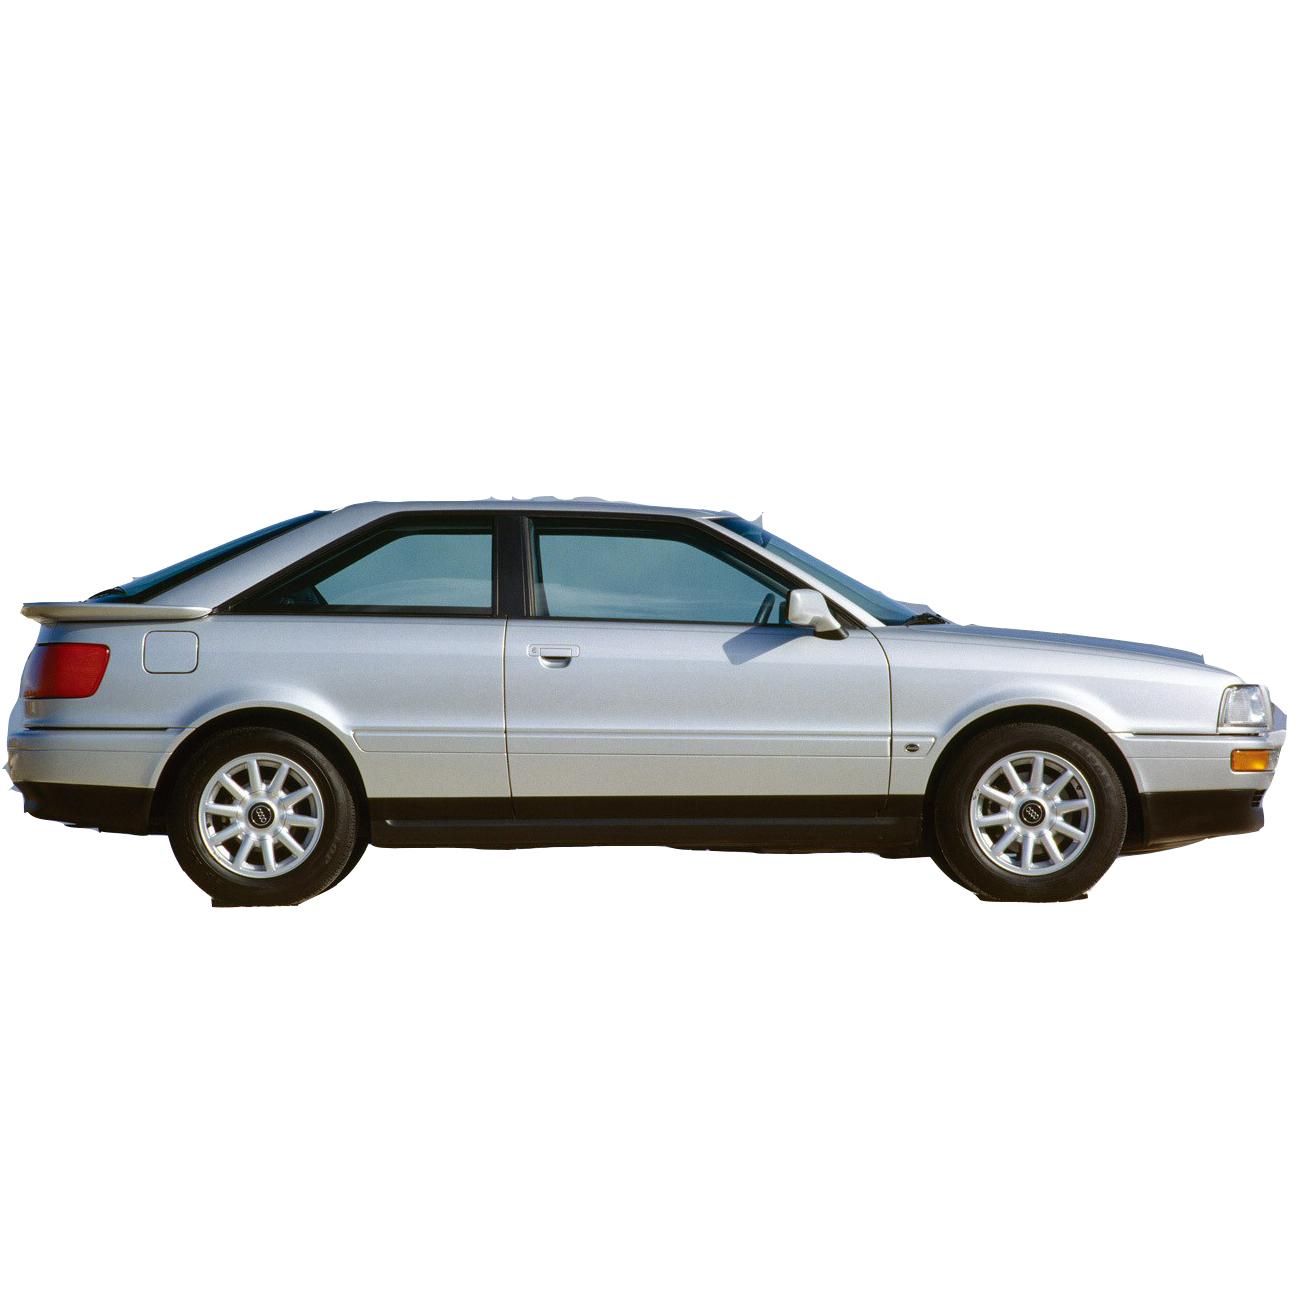 Audi 80 Coupe 1992-1996